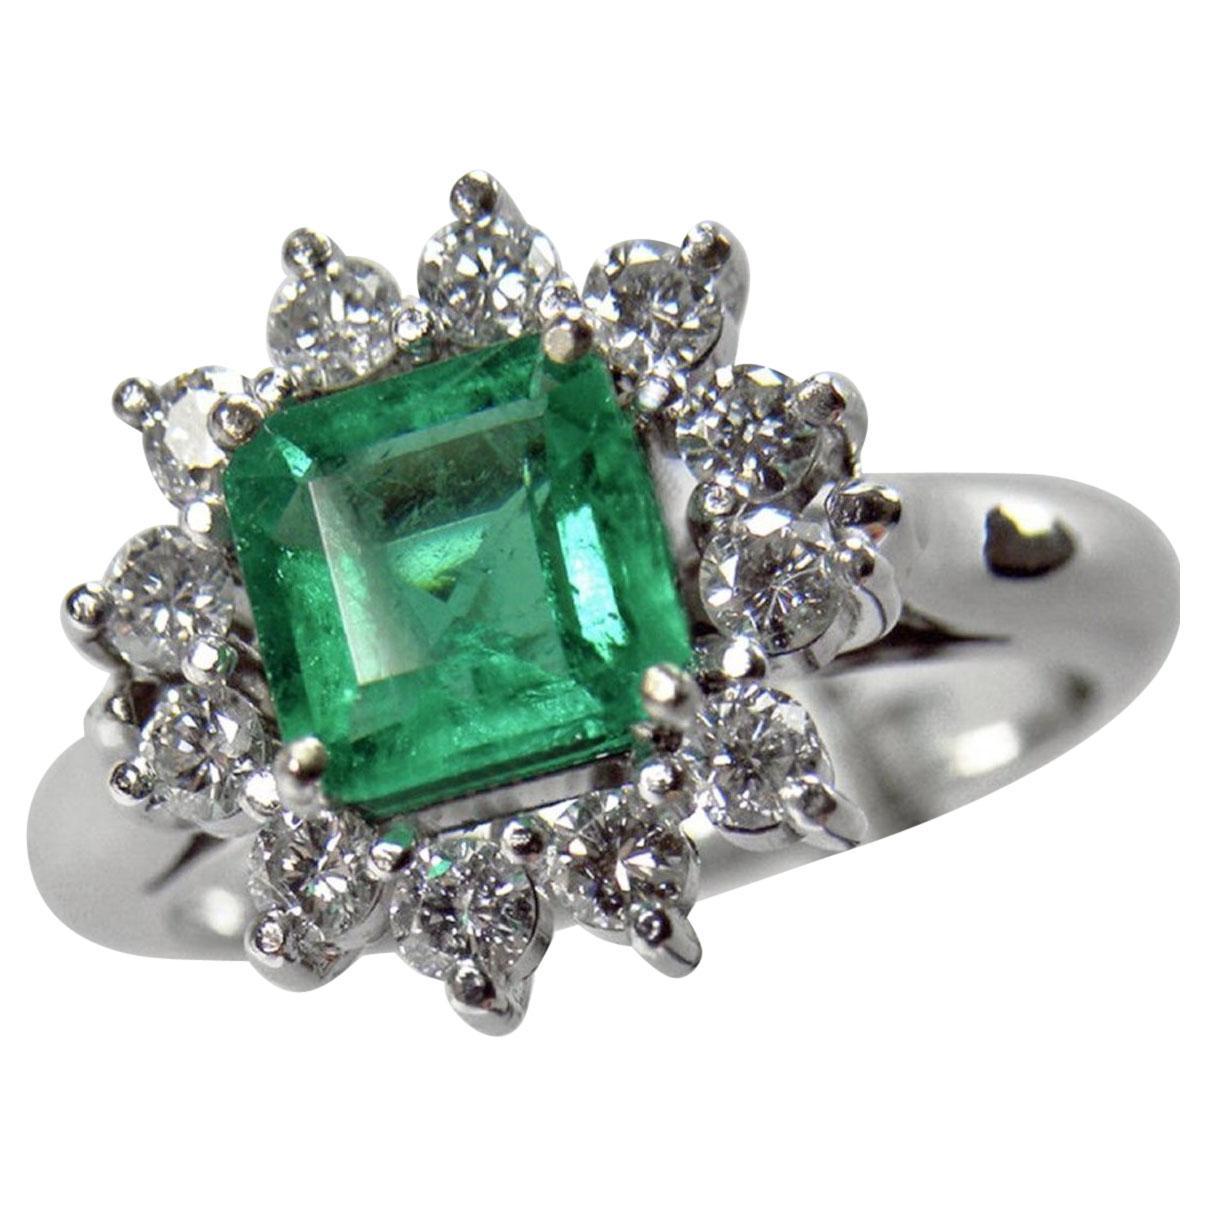 1.72 Carat Natural Fine Colombian Emerald Diamond Engagement Ring 18 Karat